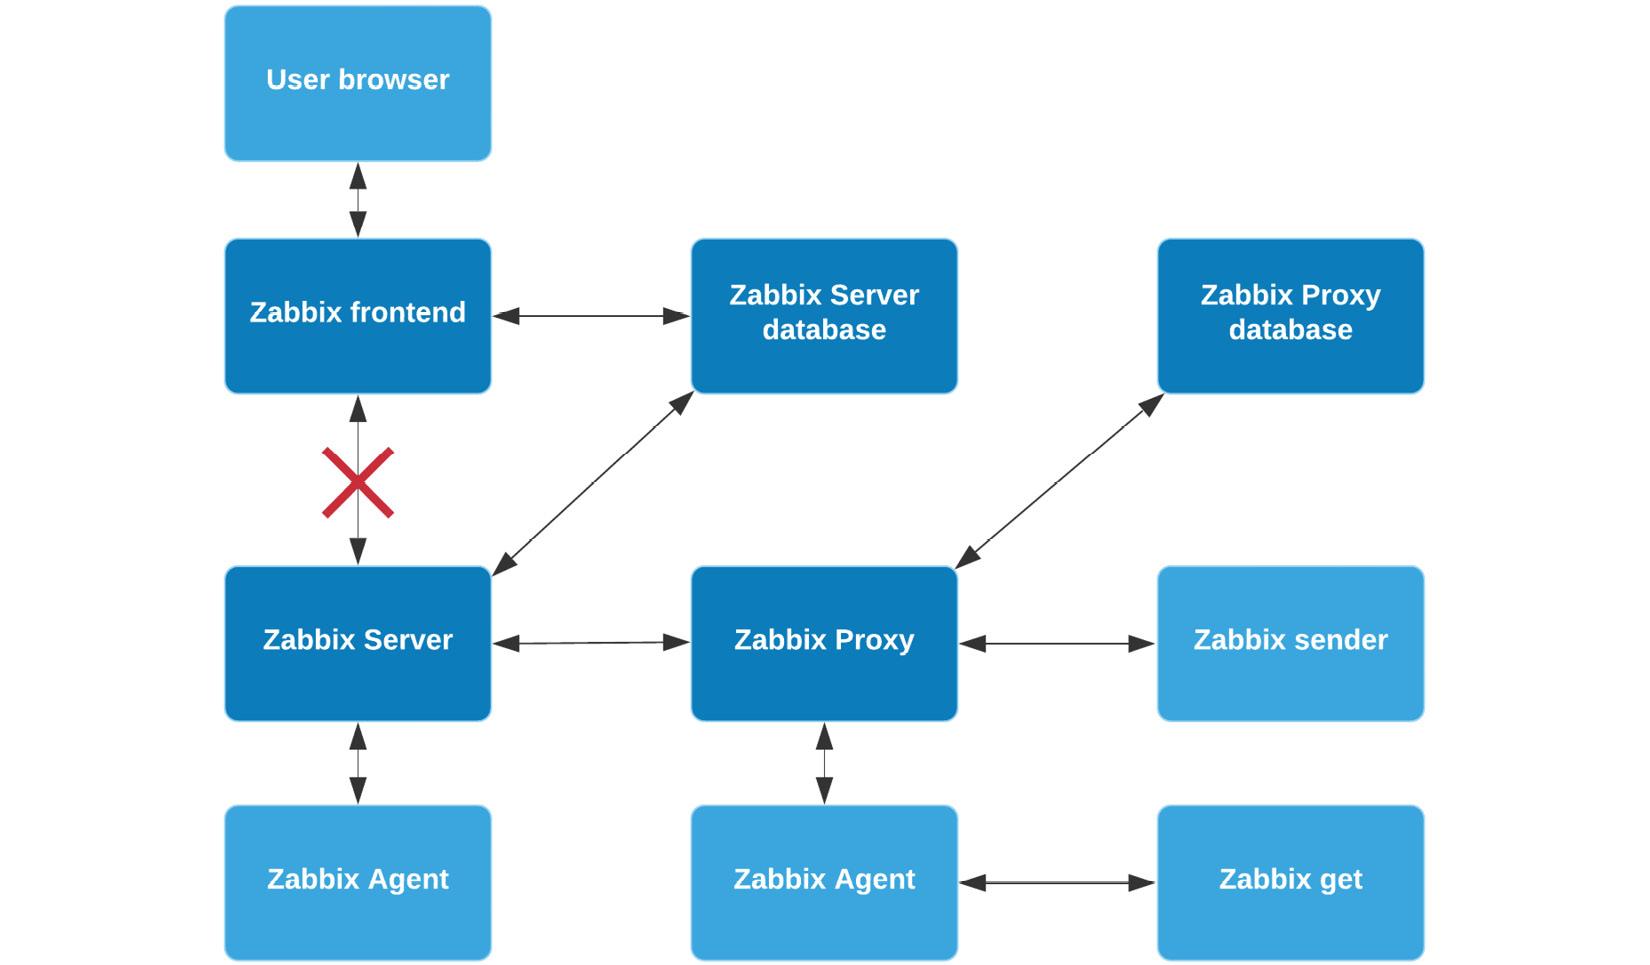 Figure 11.19 – Zabbix encryption scheme possibilites